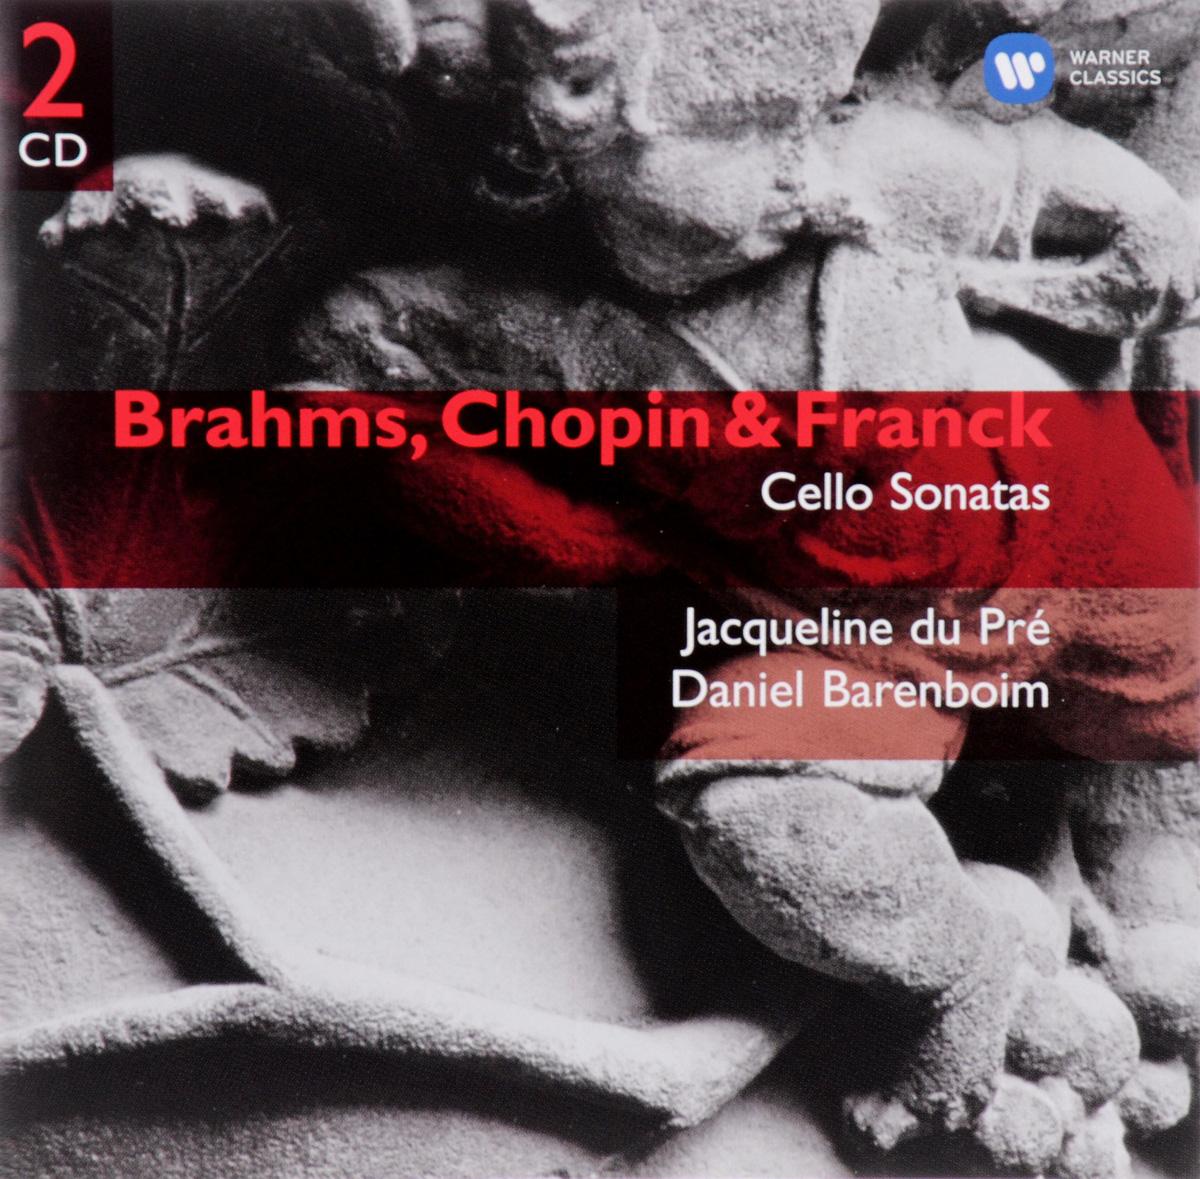 Иоганнес (Йоханнес) Брамс,Фредерик Шопен,Дэниэл Баренбойм Brahms, Chopin & Franck - Cello Sonatas (2 CD) spectral classics pl151 bg 2 boxes